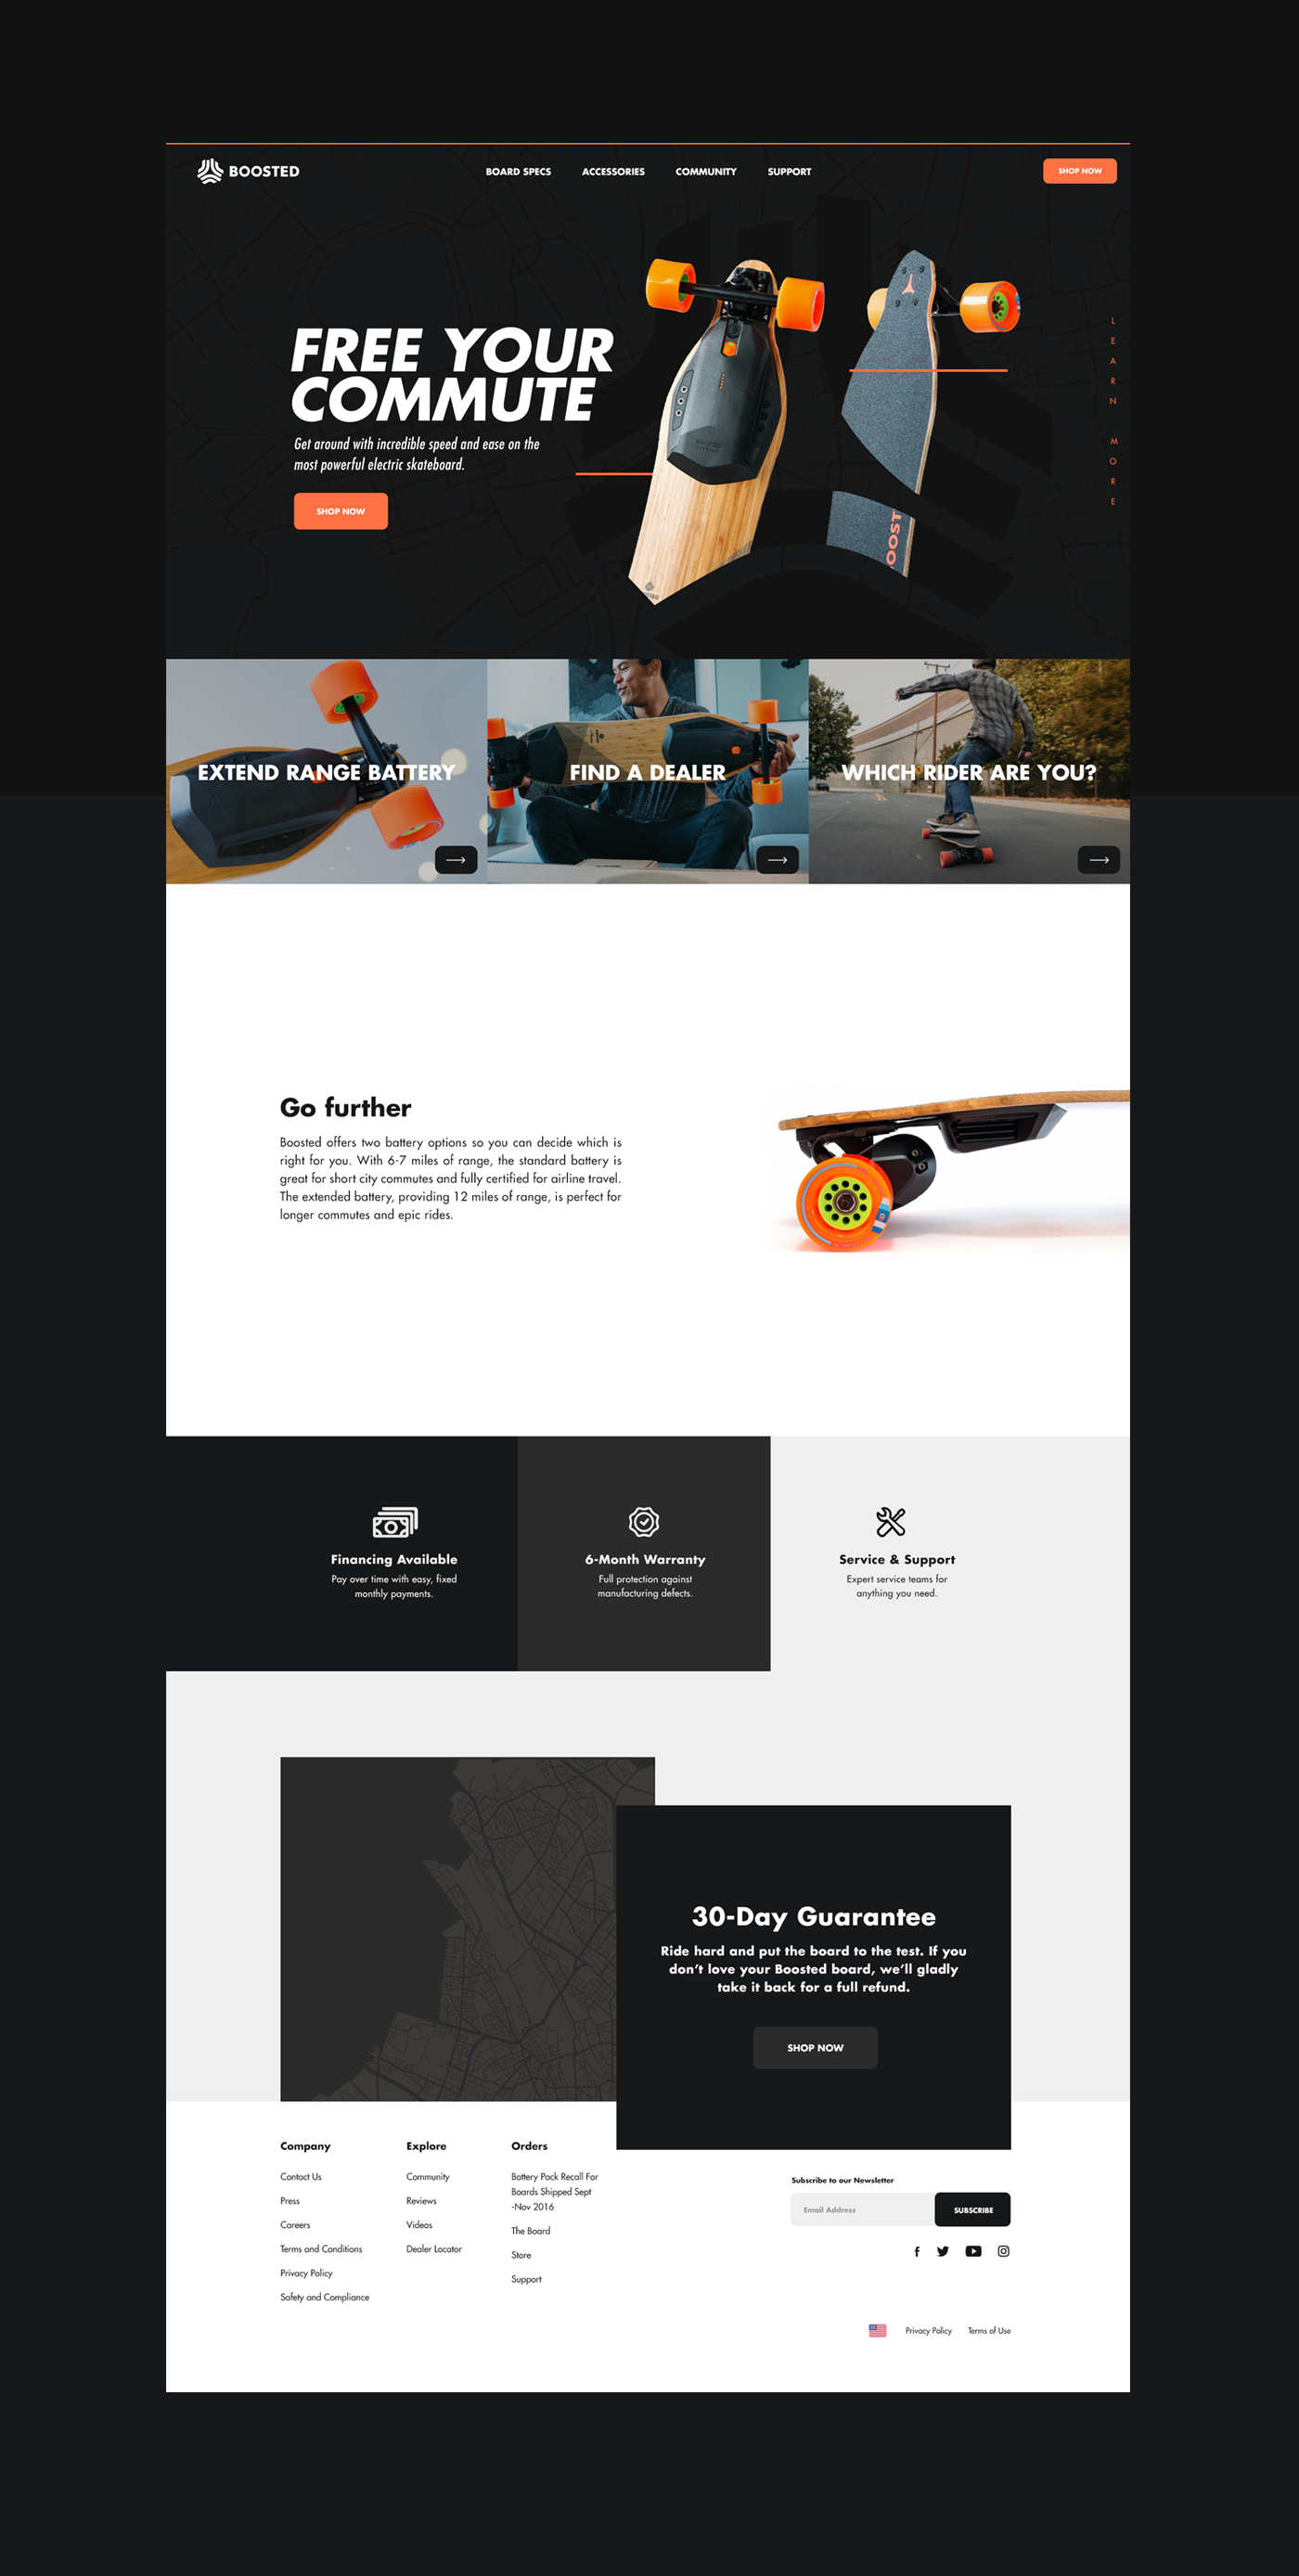 UI/UX boosted   Boosted Boards branding  art direction  graphic design  Web Design  Interaction design  skateboards design